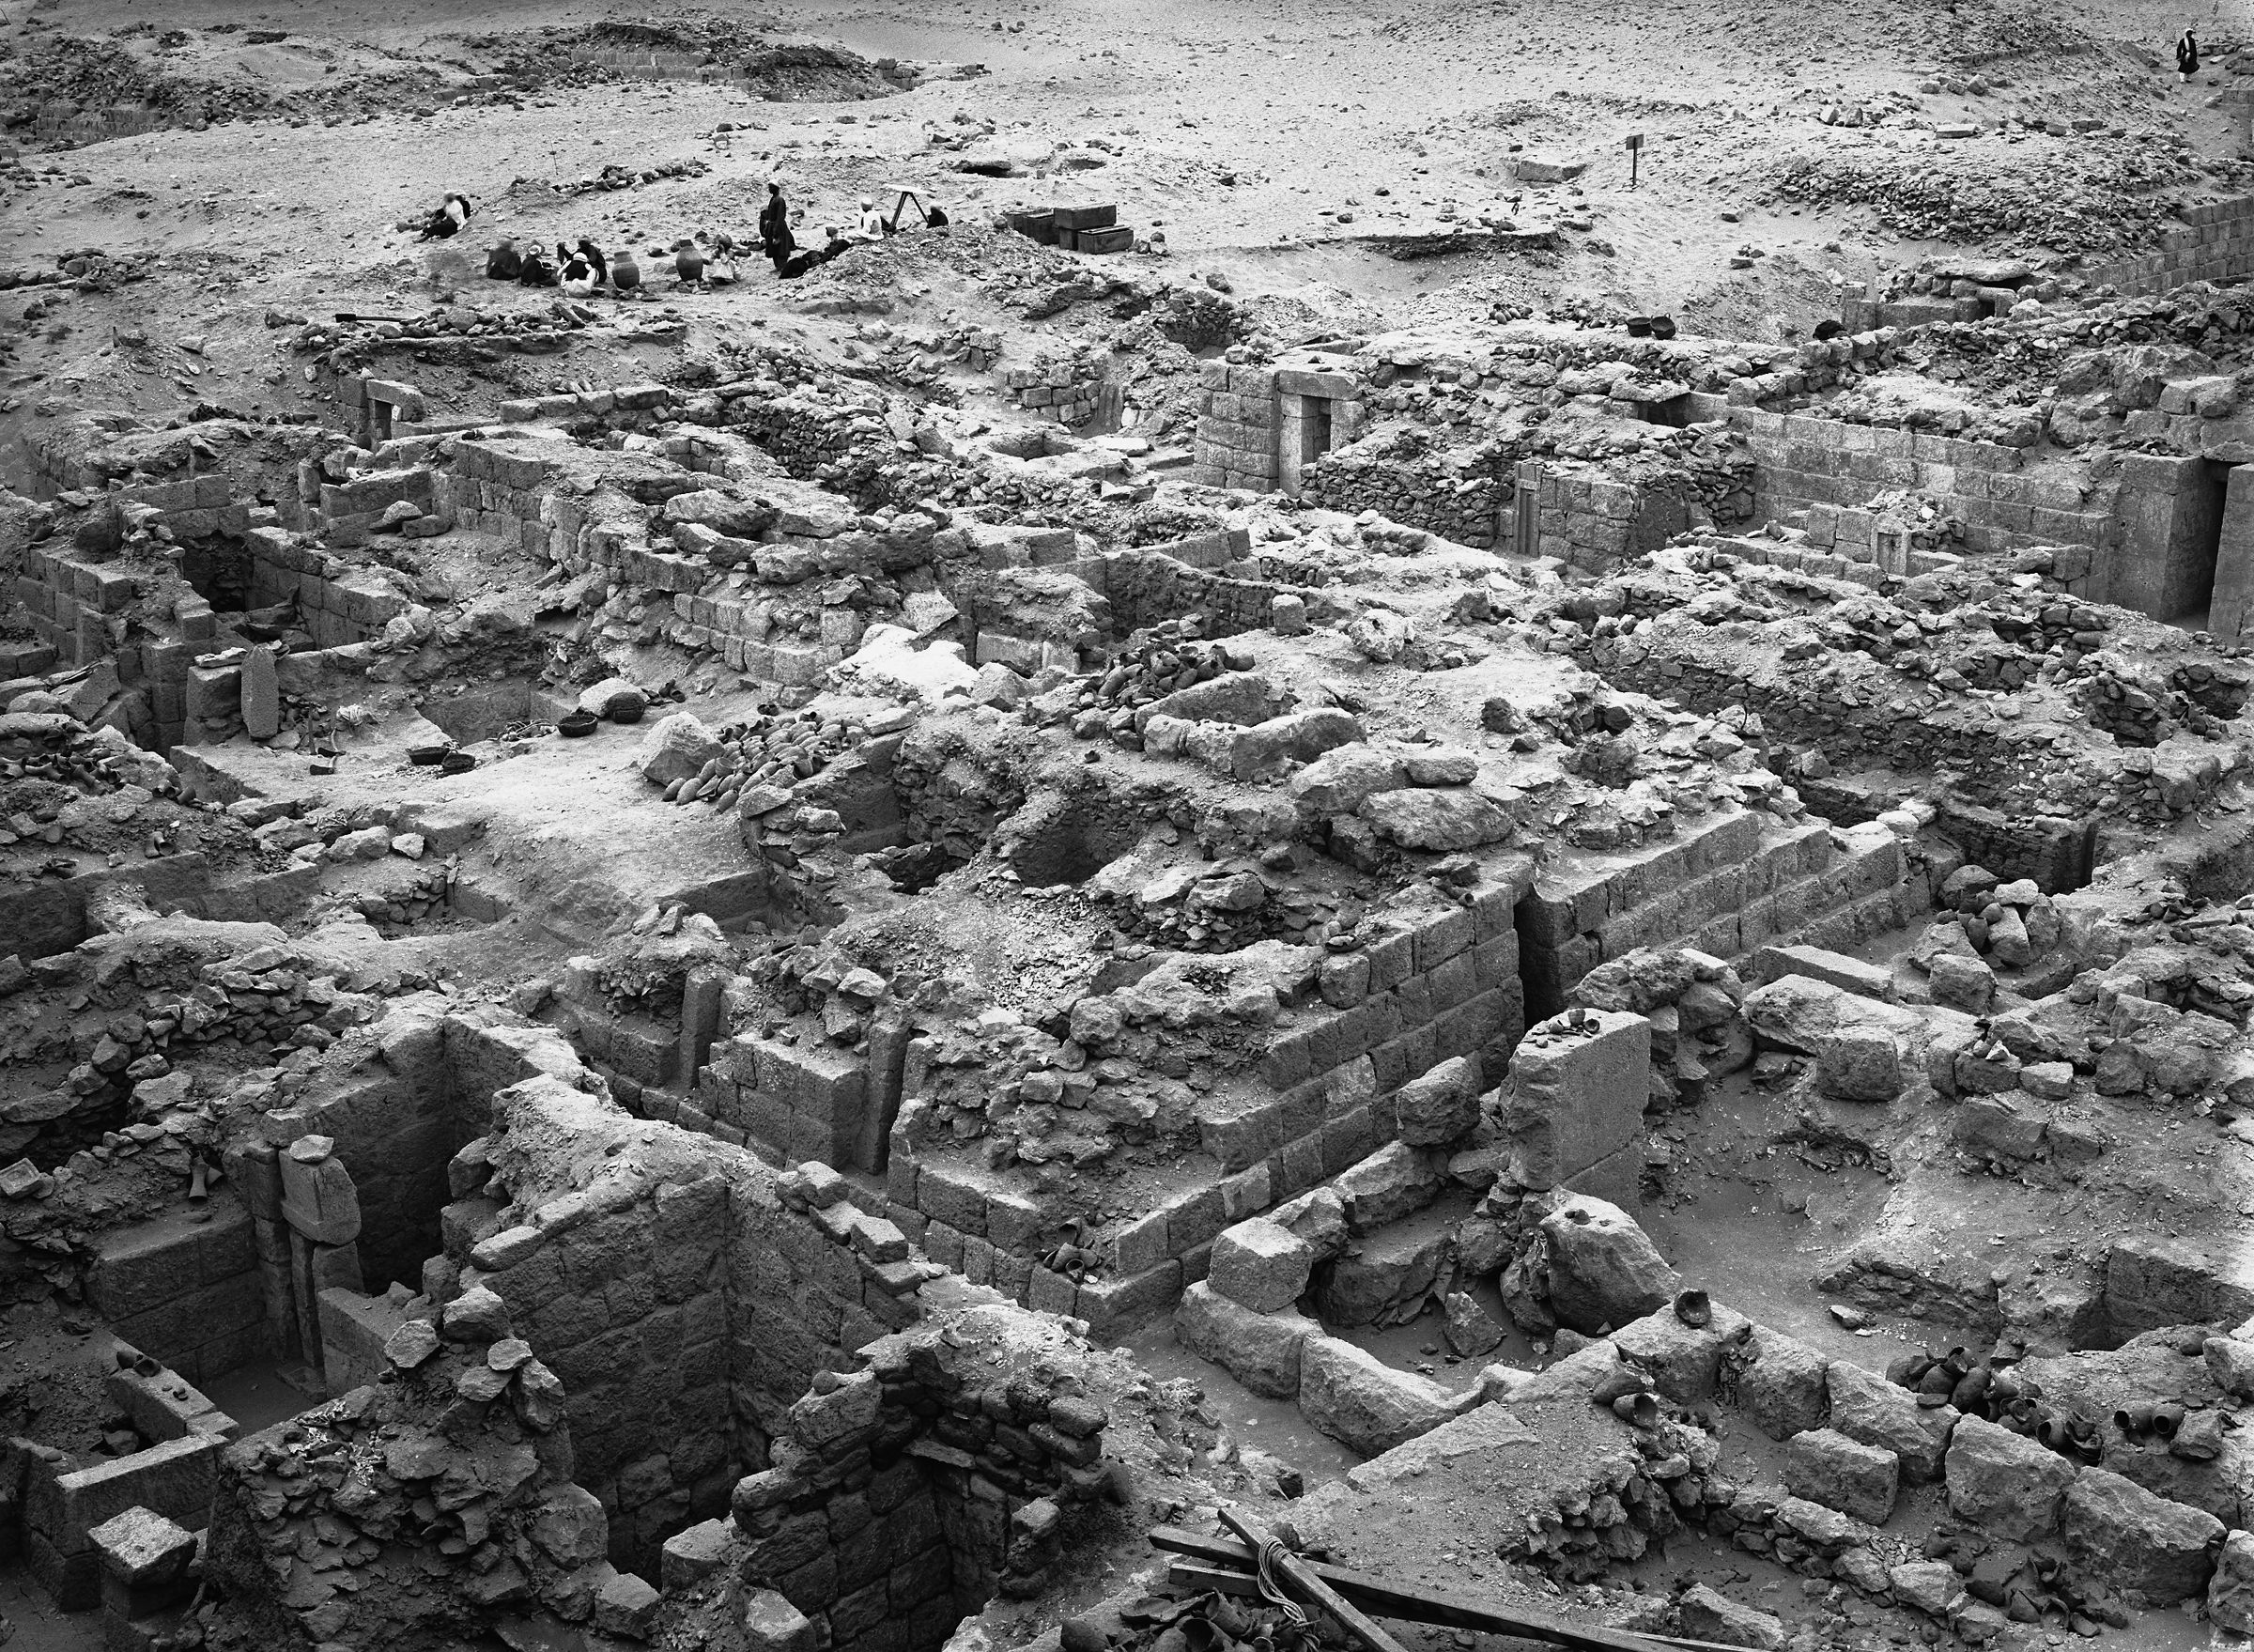 Western Cemetery: Site: Giza; View: G 1025, G 1027, G 1031, G 1022, G 1024, G 1011